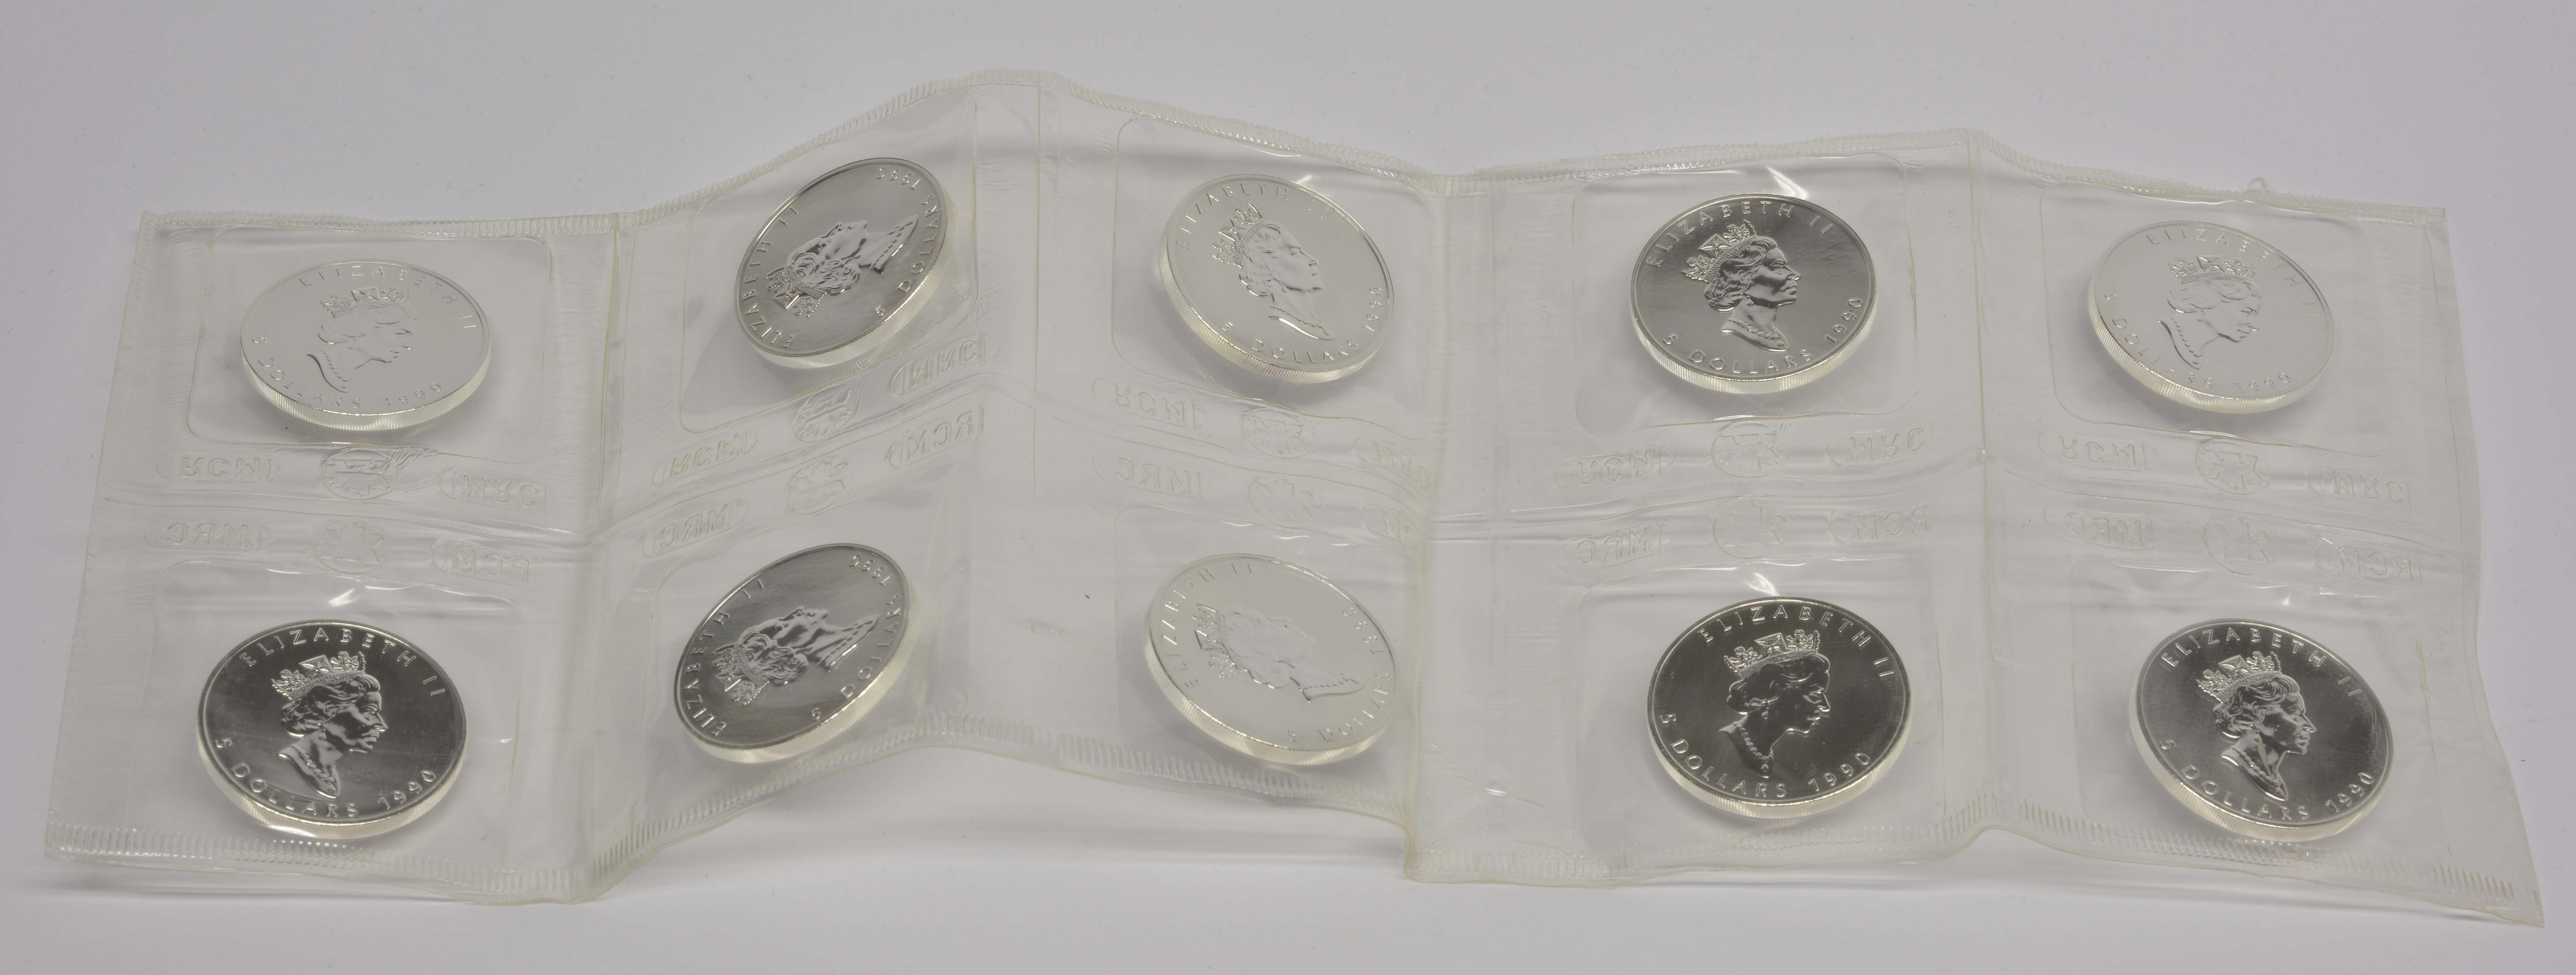 Rückseite:Kanada : 5 Dollar 10x Maple Leaf original verschweißt  1990 bfr